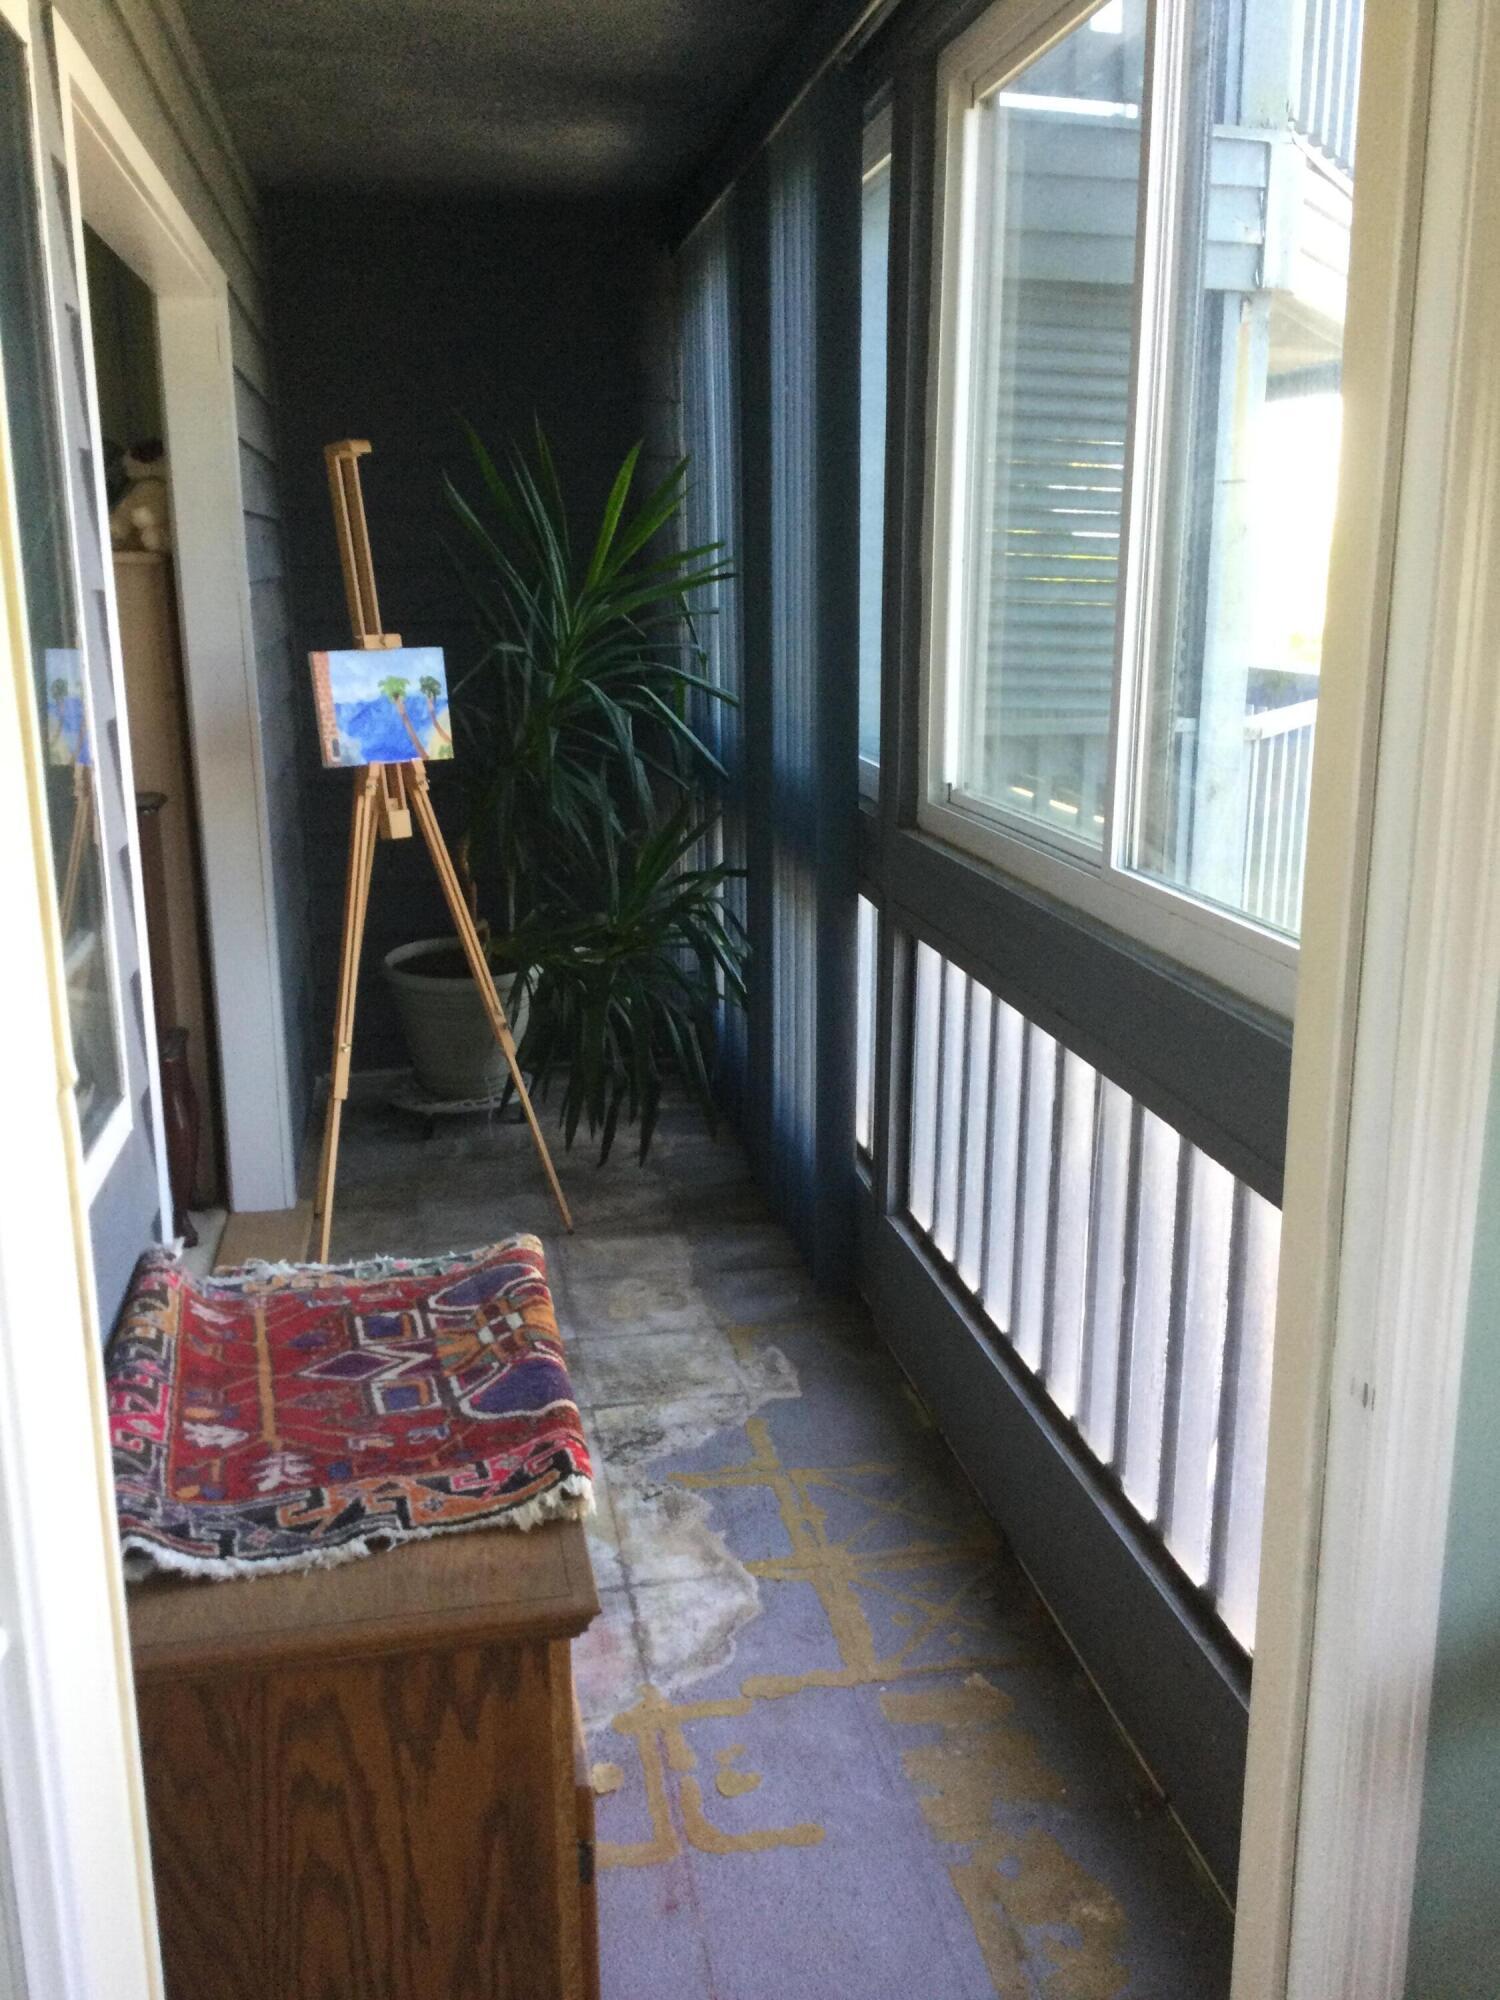 Marshview Villas Homes For Sale - 124 Mariners Cay, Folly Beach, SC - 7